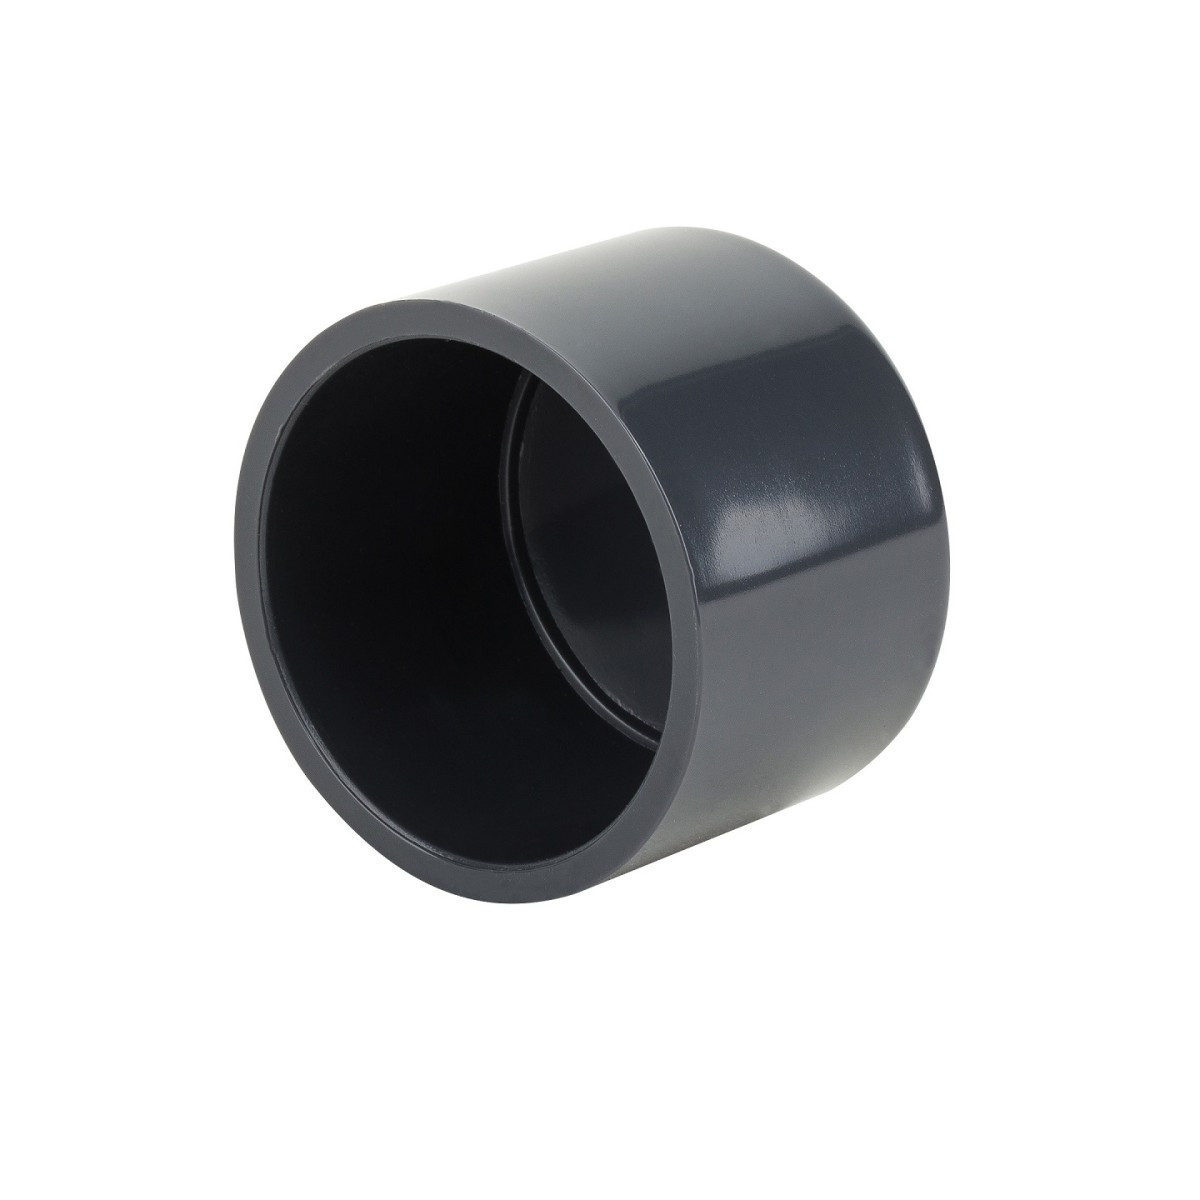 Заглушка ПВХ Aquaviva клеевая, диаметр 110 мм.